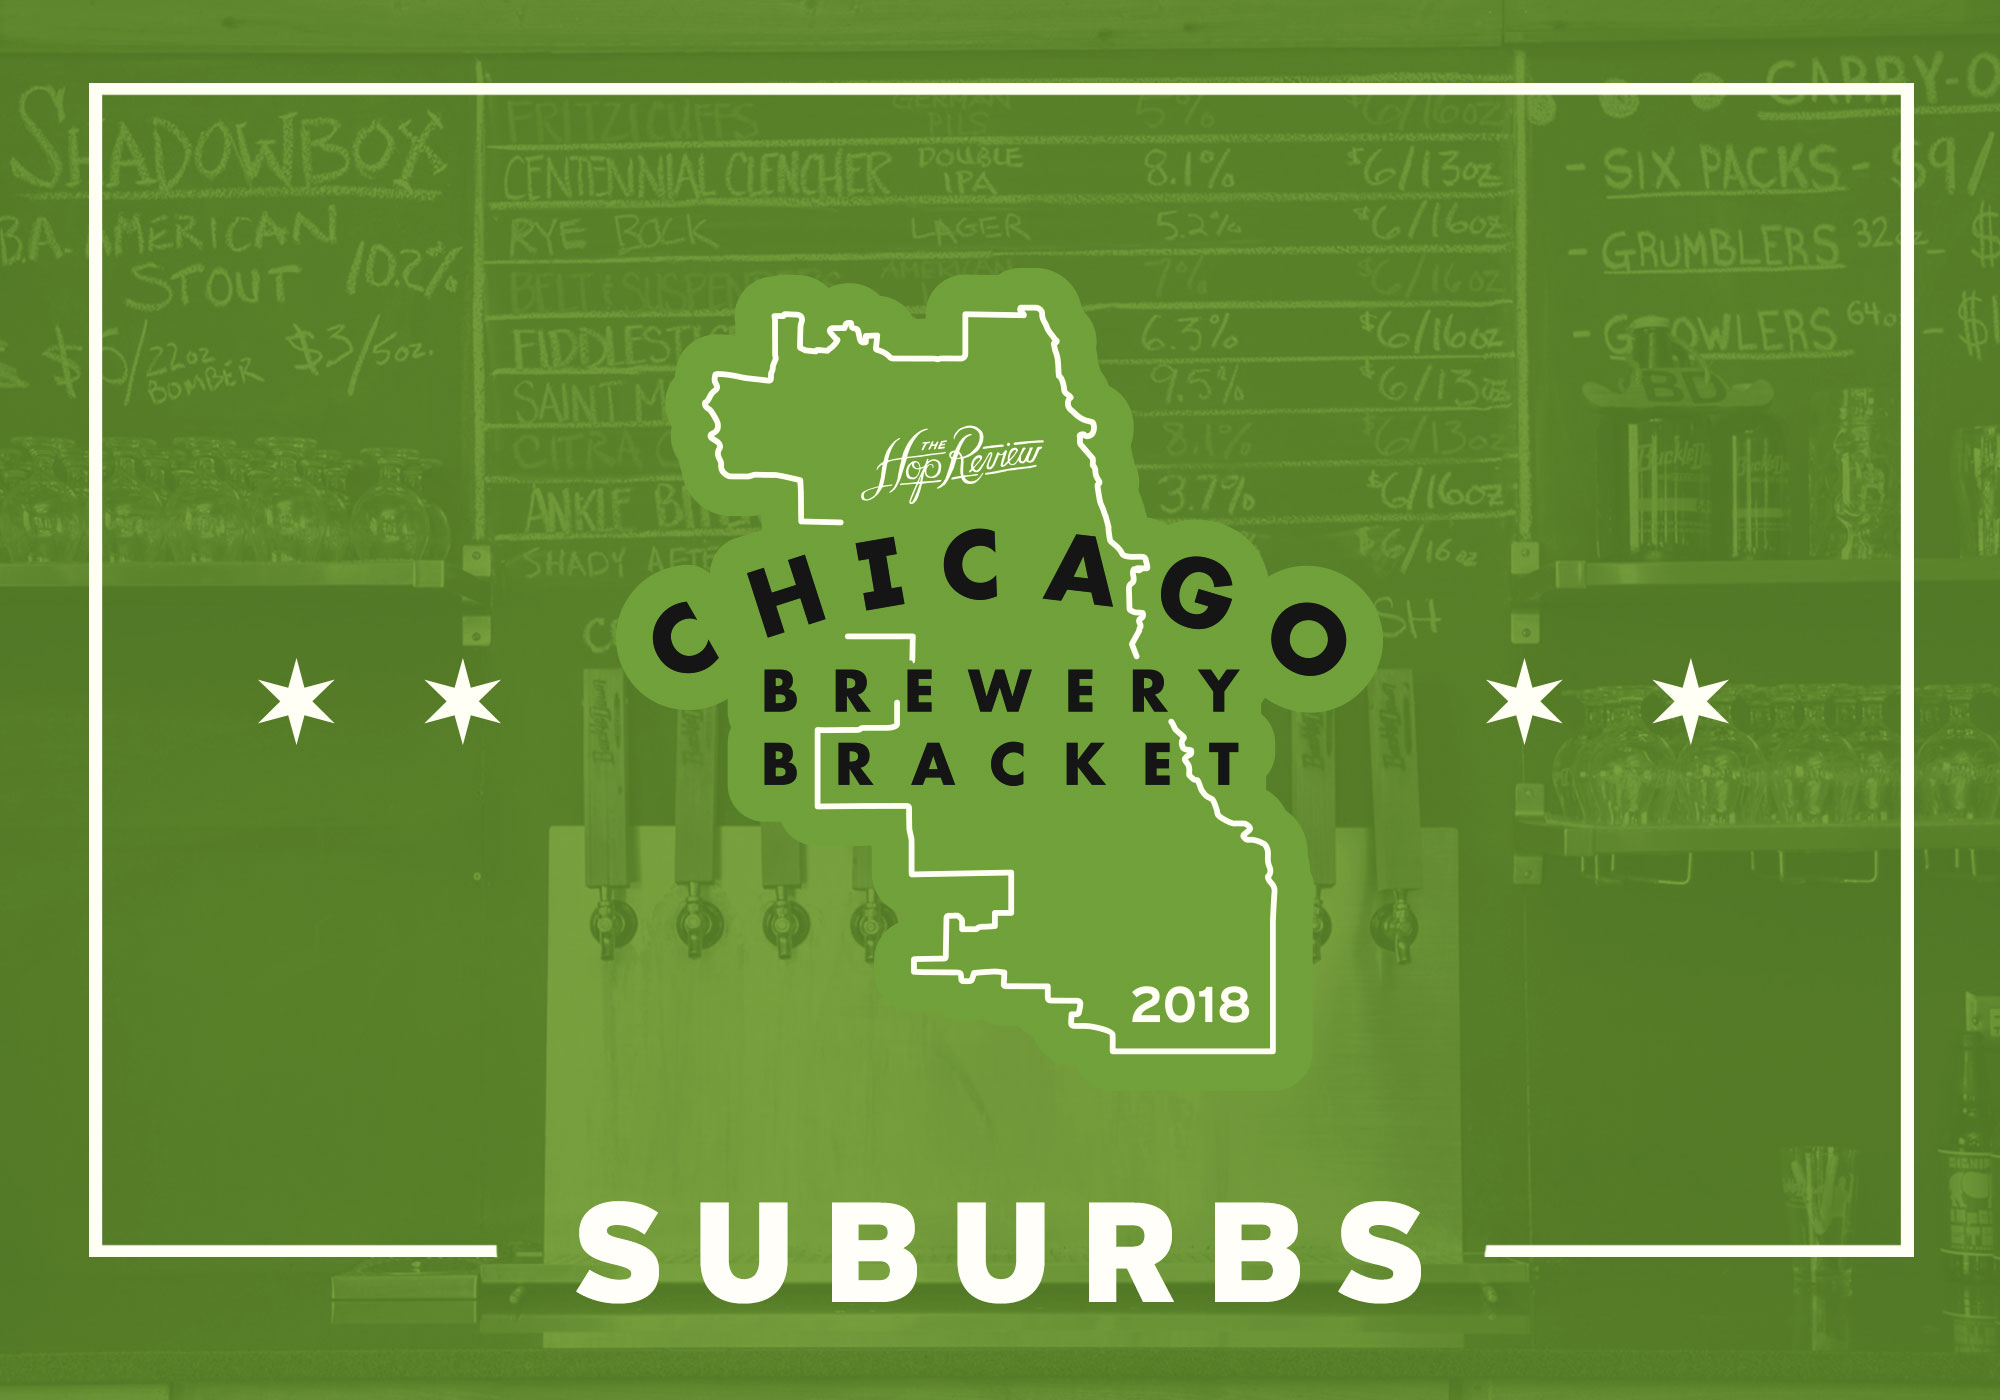 2018 Chicago Brewery Bracket: Suburbs – Rd. 1